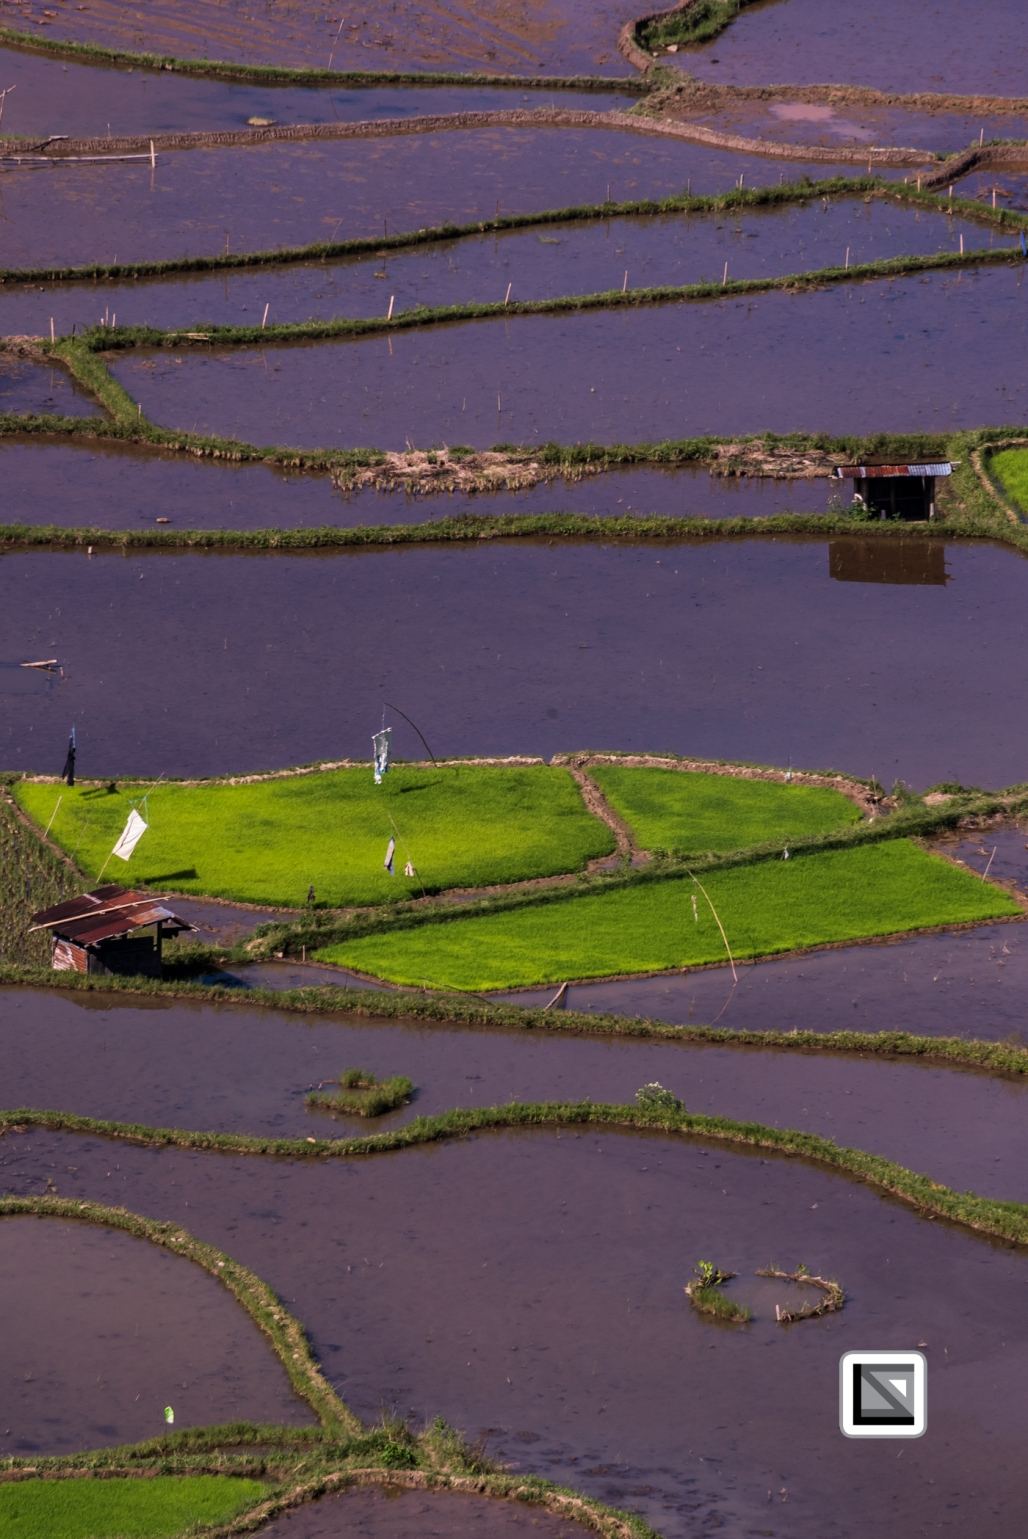 Indonesia-Toraja-Baruppo-Ricefields-7